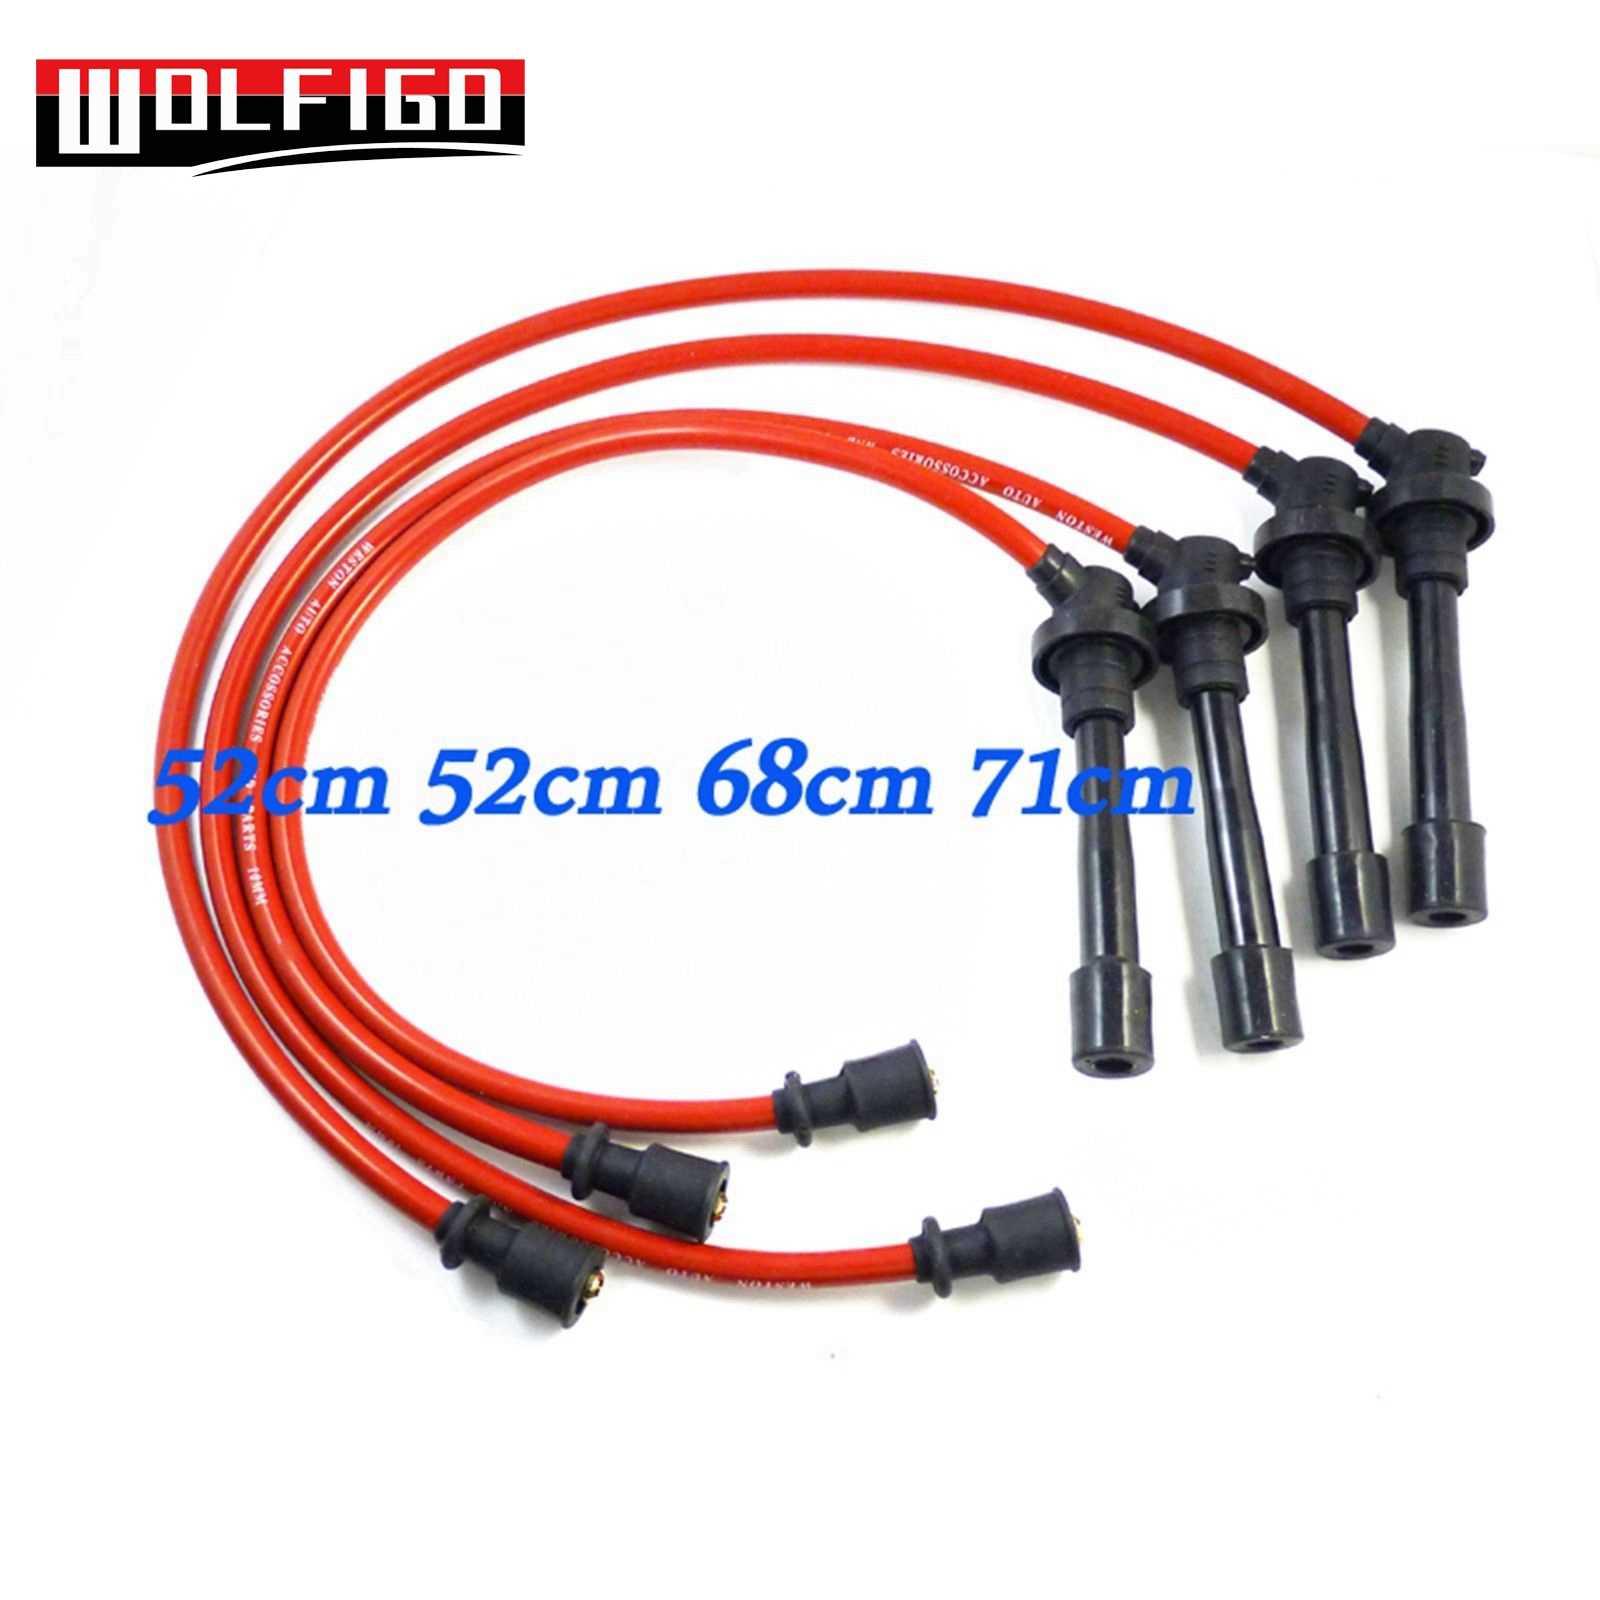 WOLFIGO Red Spark Plug Wires Set 10.2MM Silicone Fit Mitsubishi Eagle on